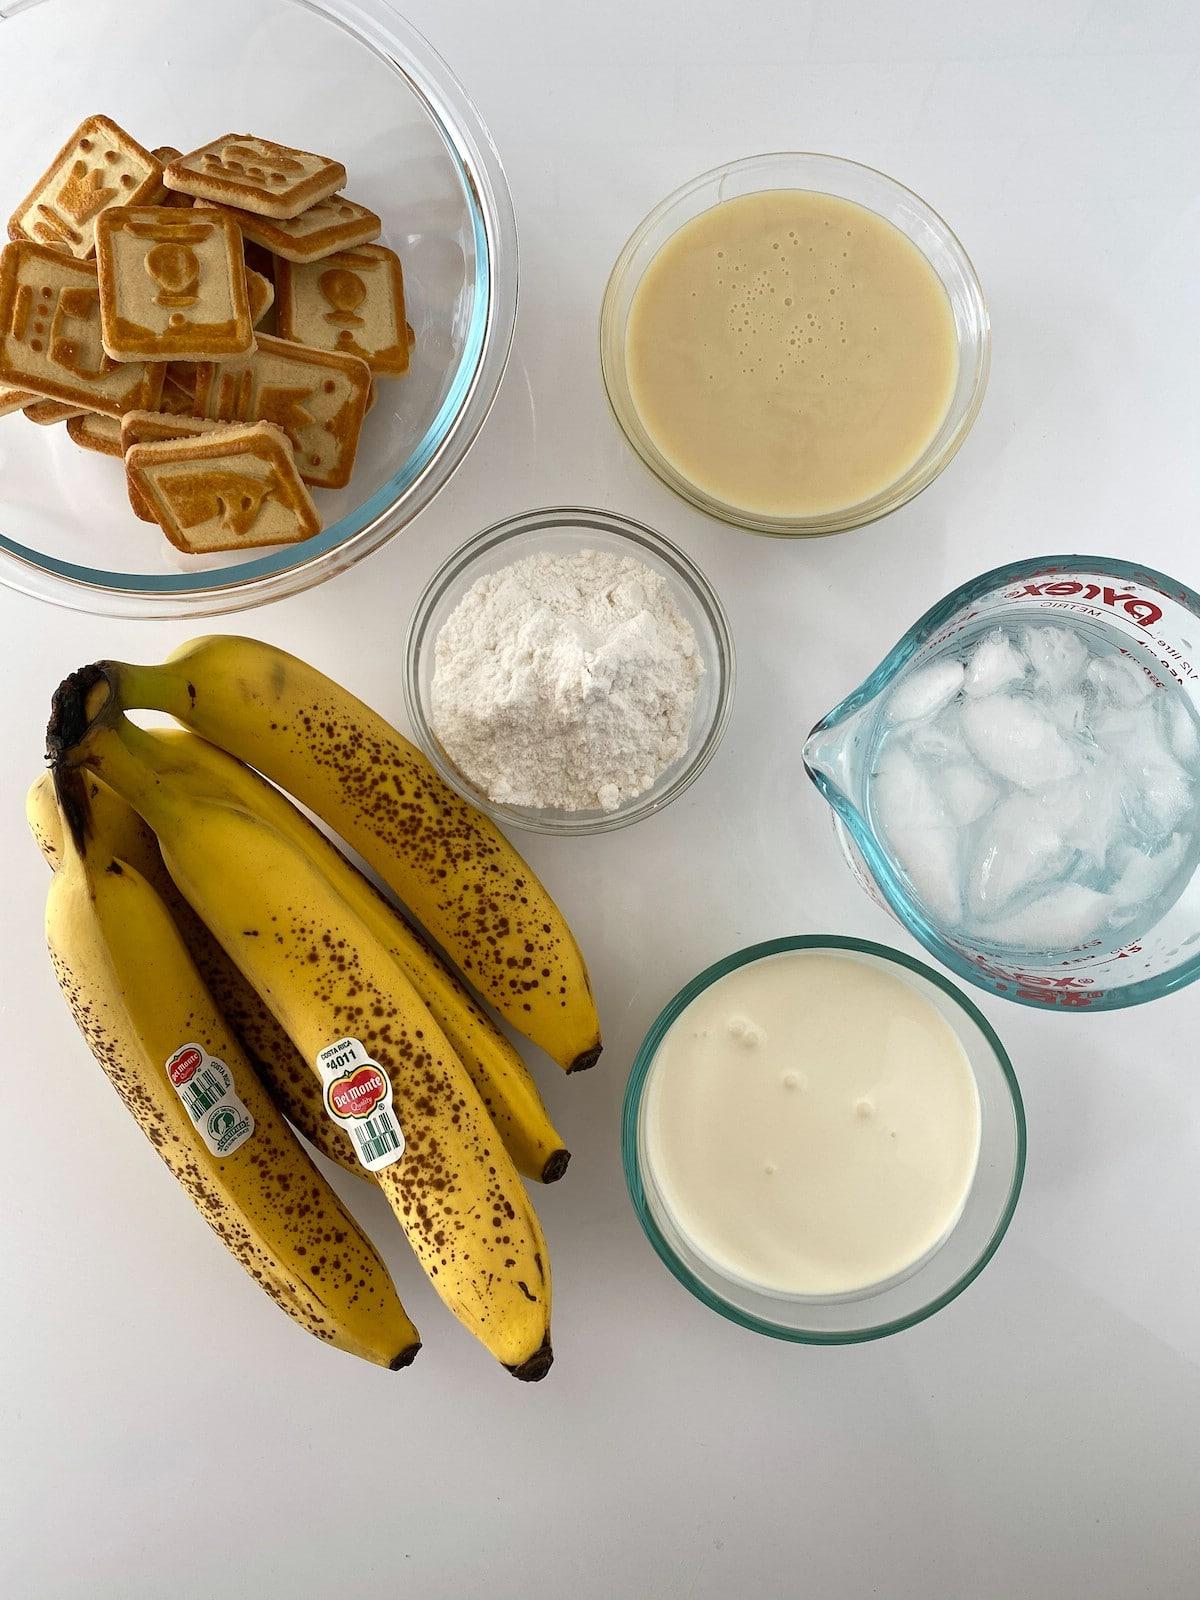 Ingredients for no bake banana pudding